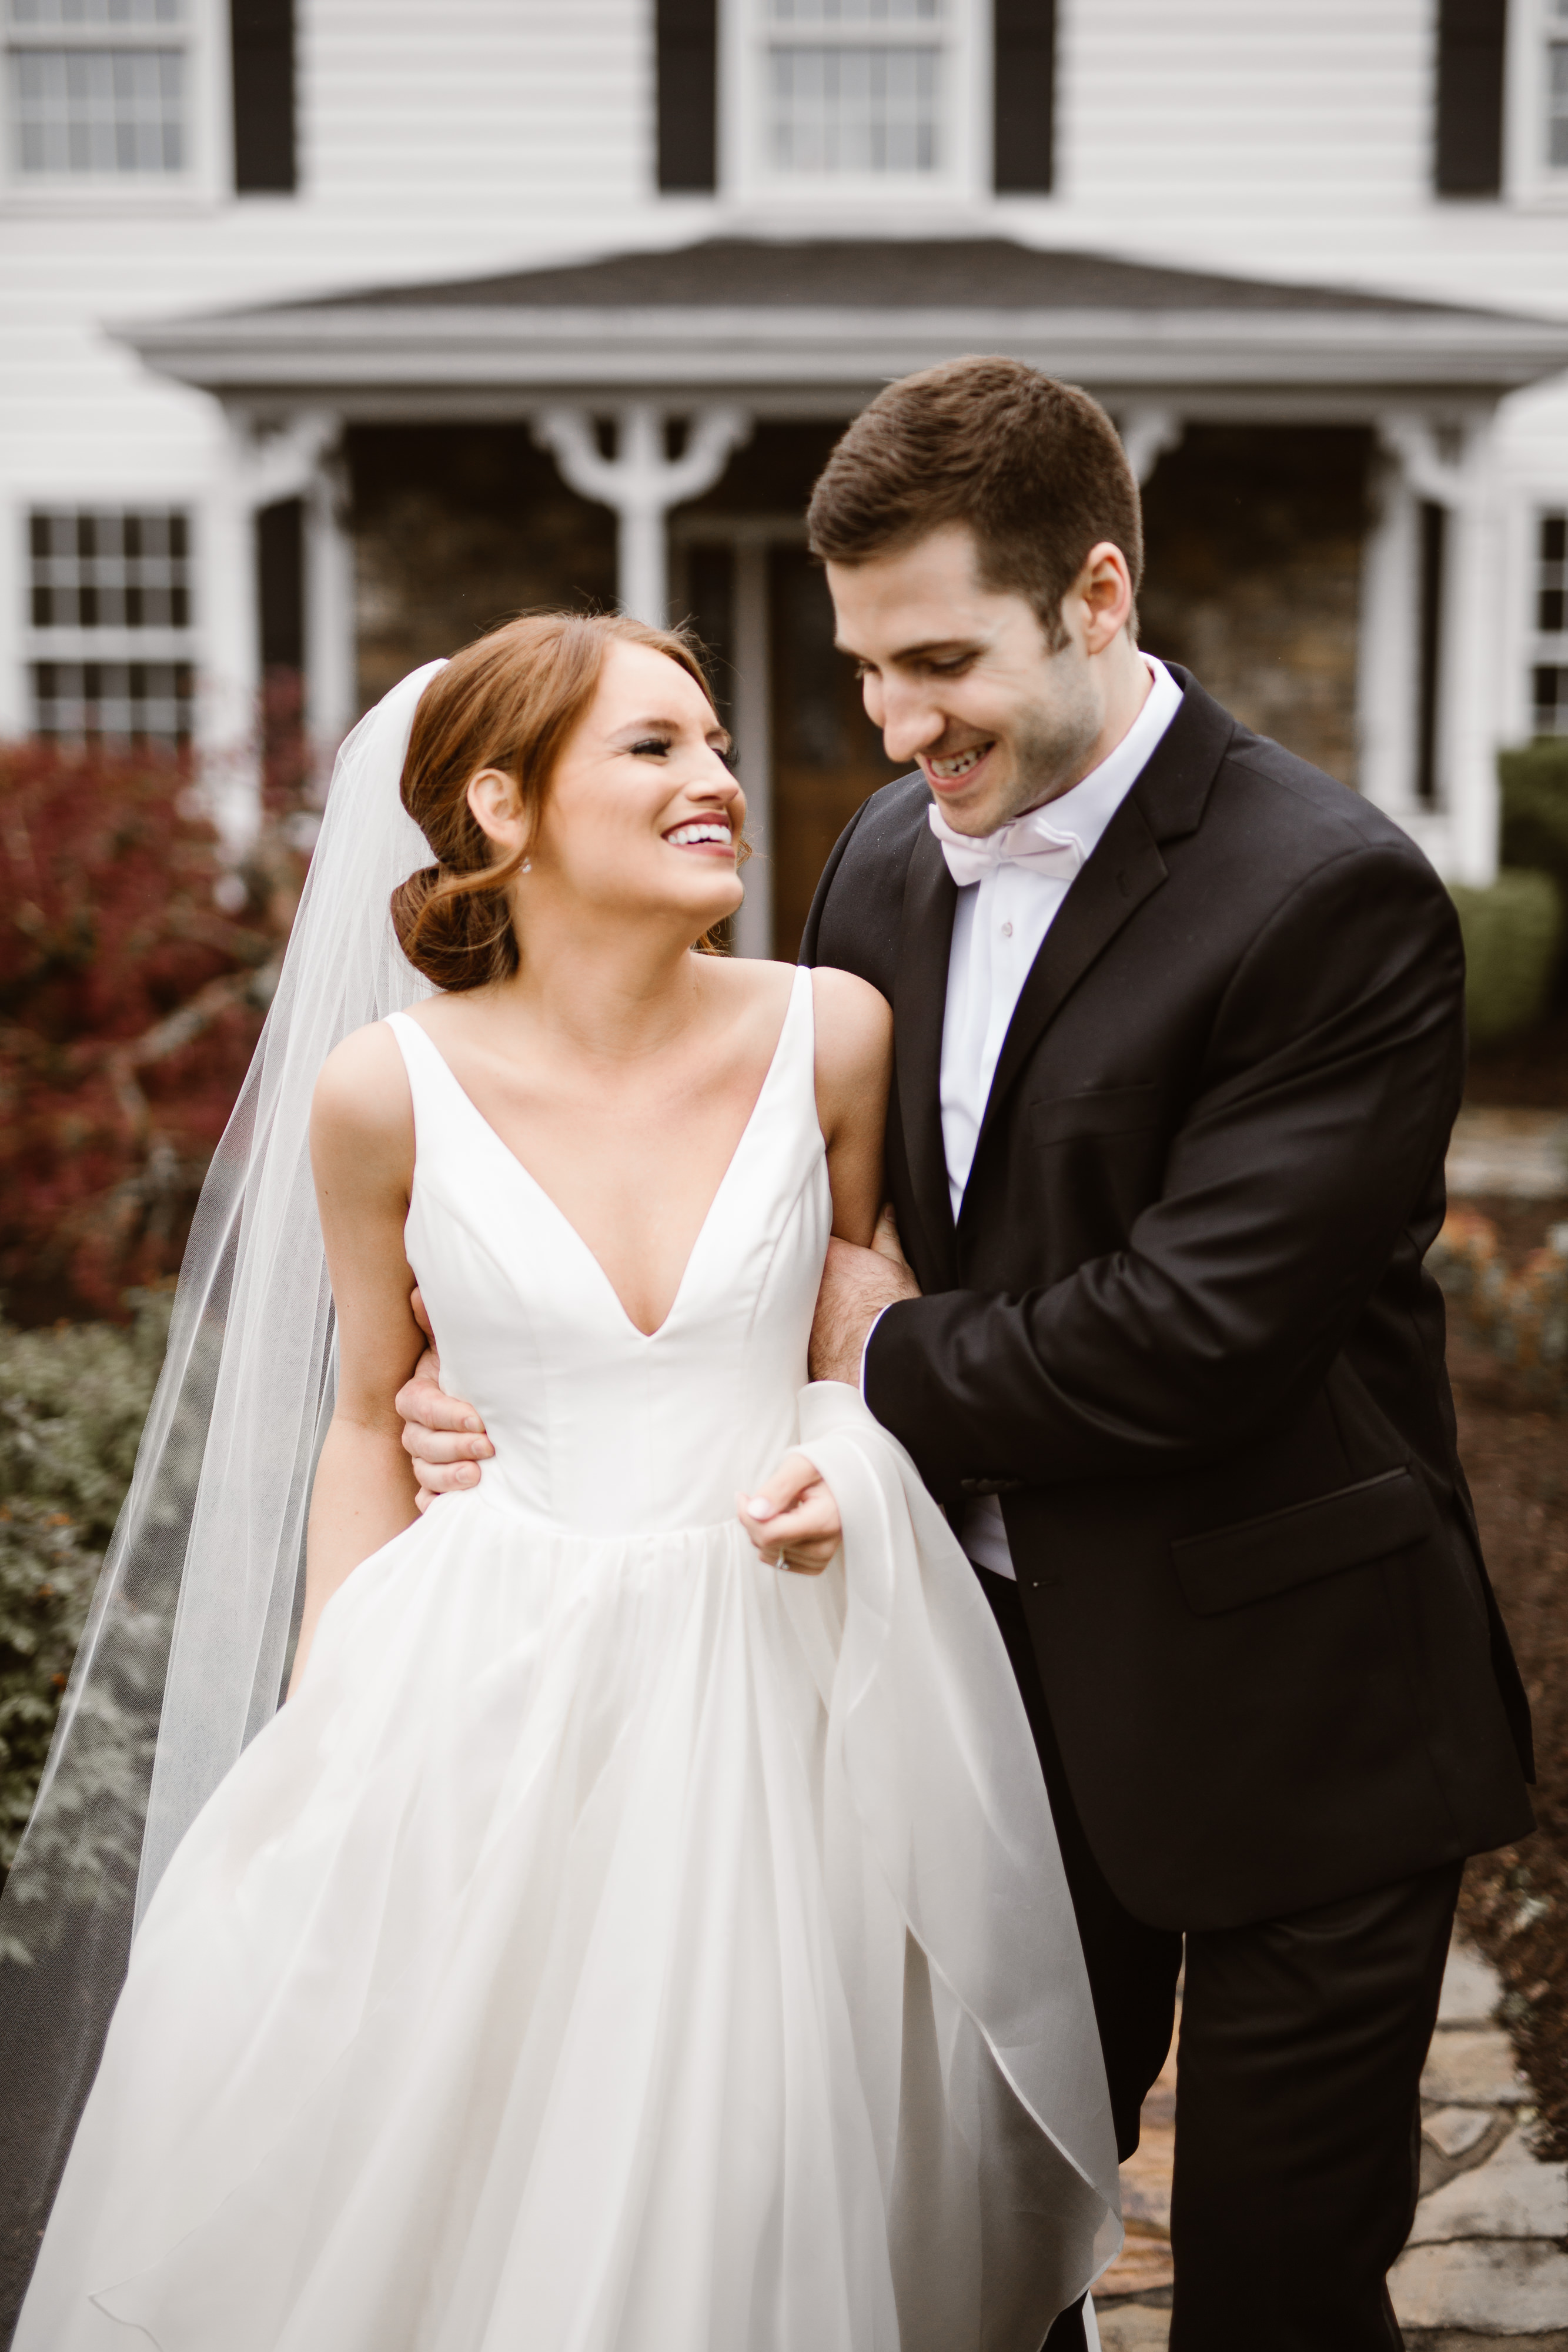 Carly And Evan Wedding.Wedding Galleries Live Laugh Love Weddings